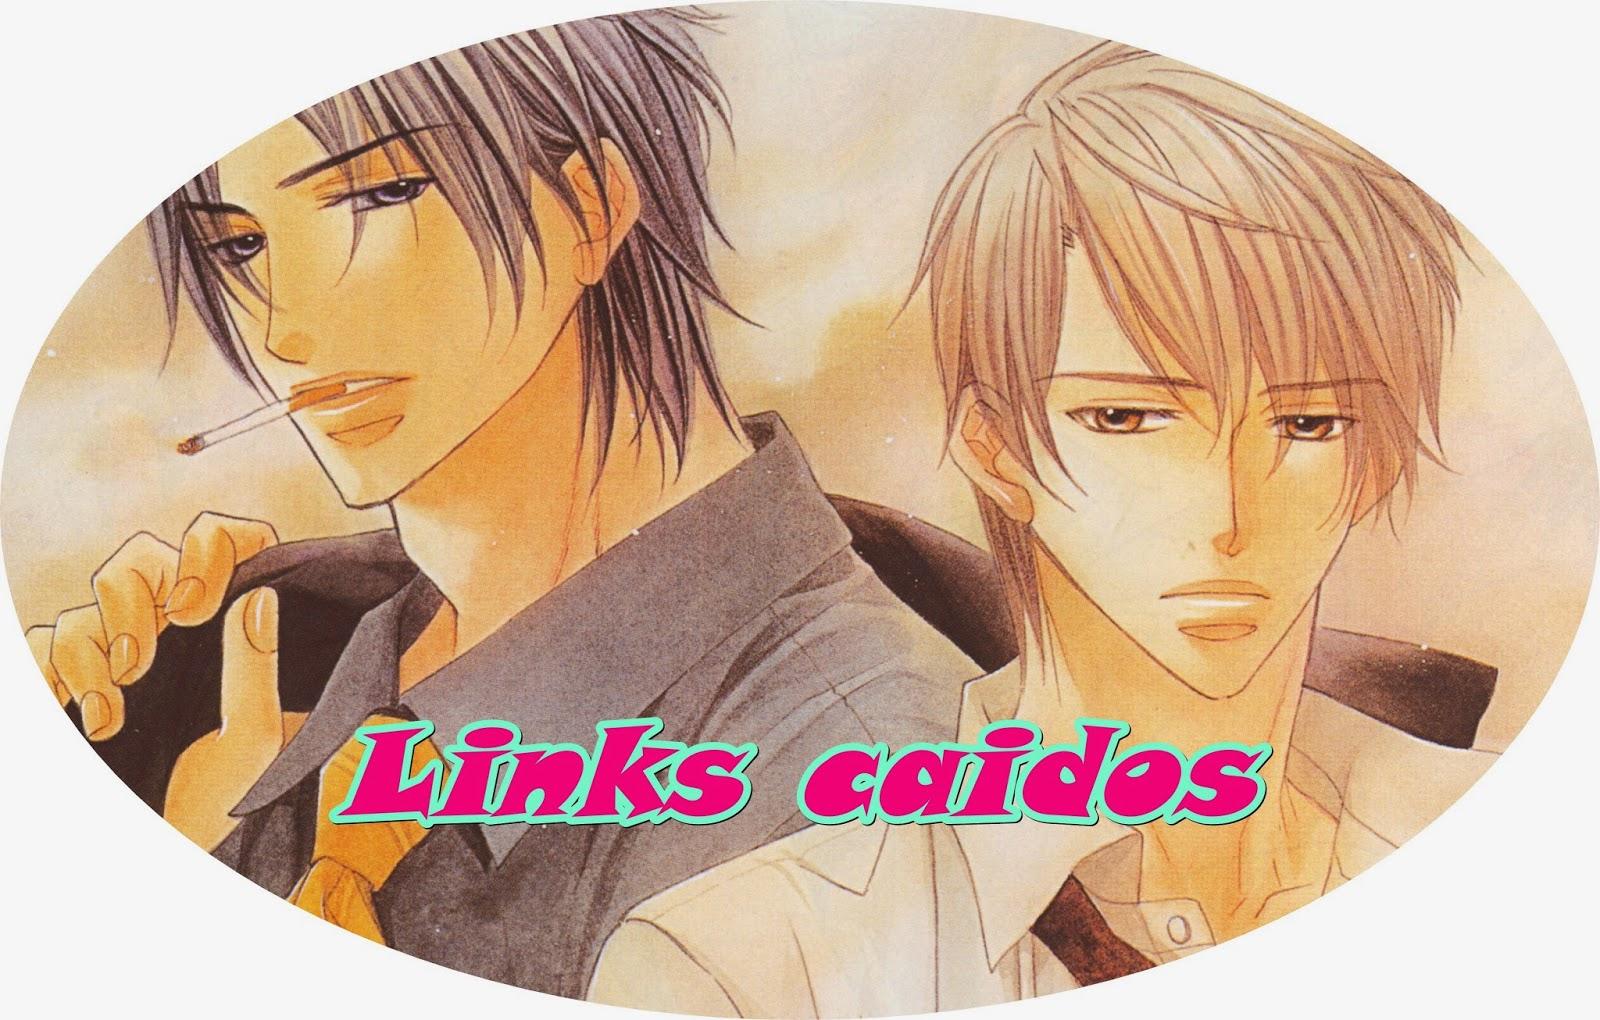 http://otakusafull.wix.com/foro-fans-otakus#!links-caidos/cfag